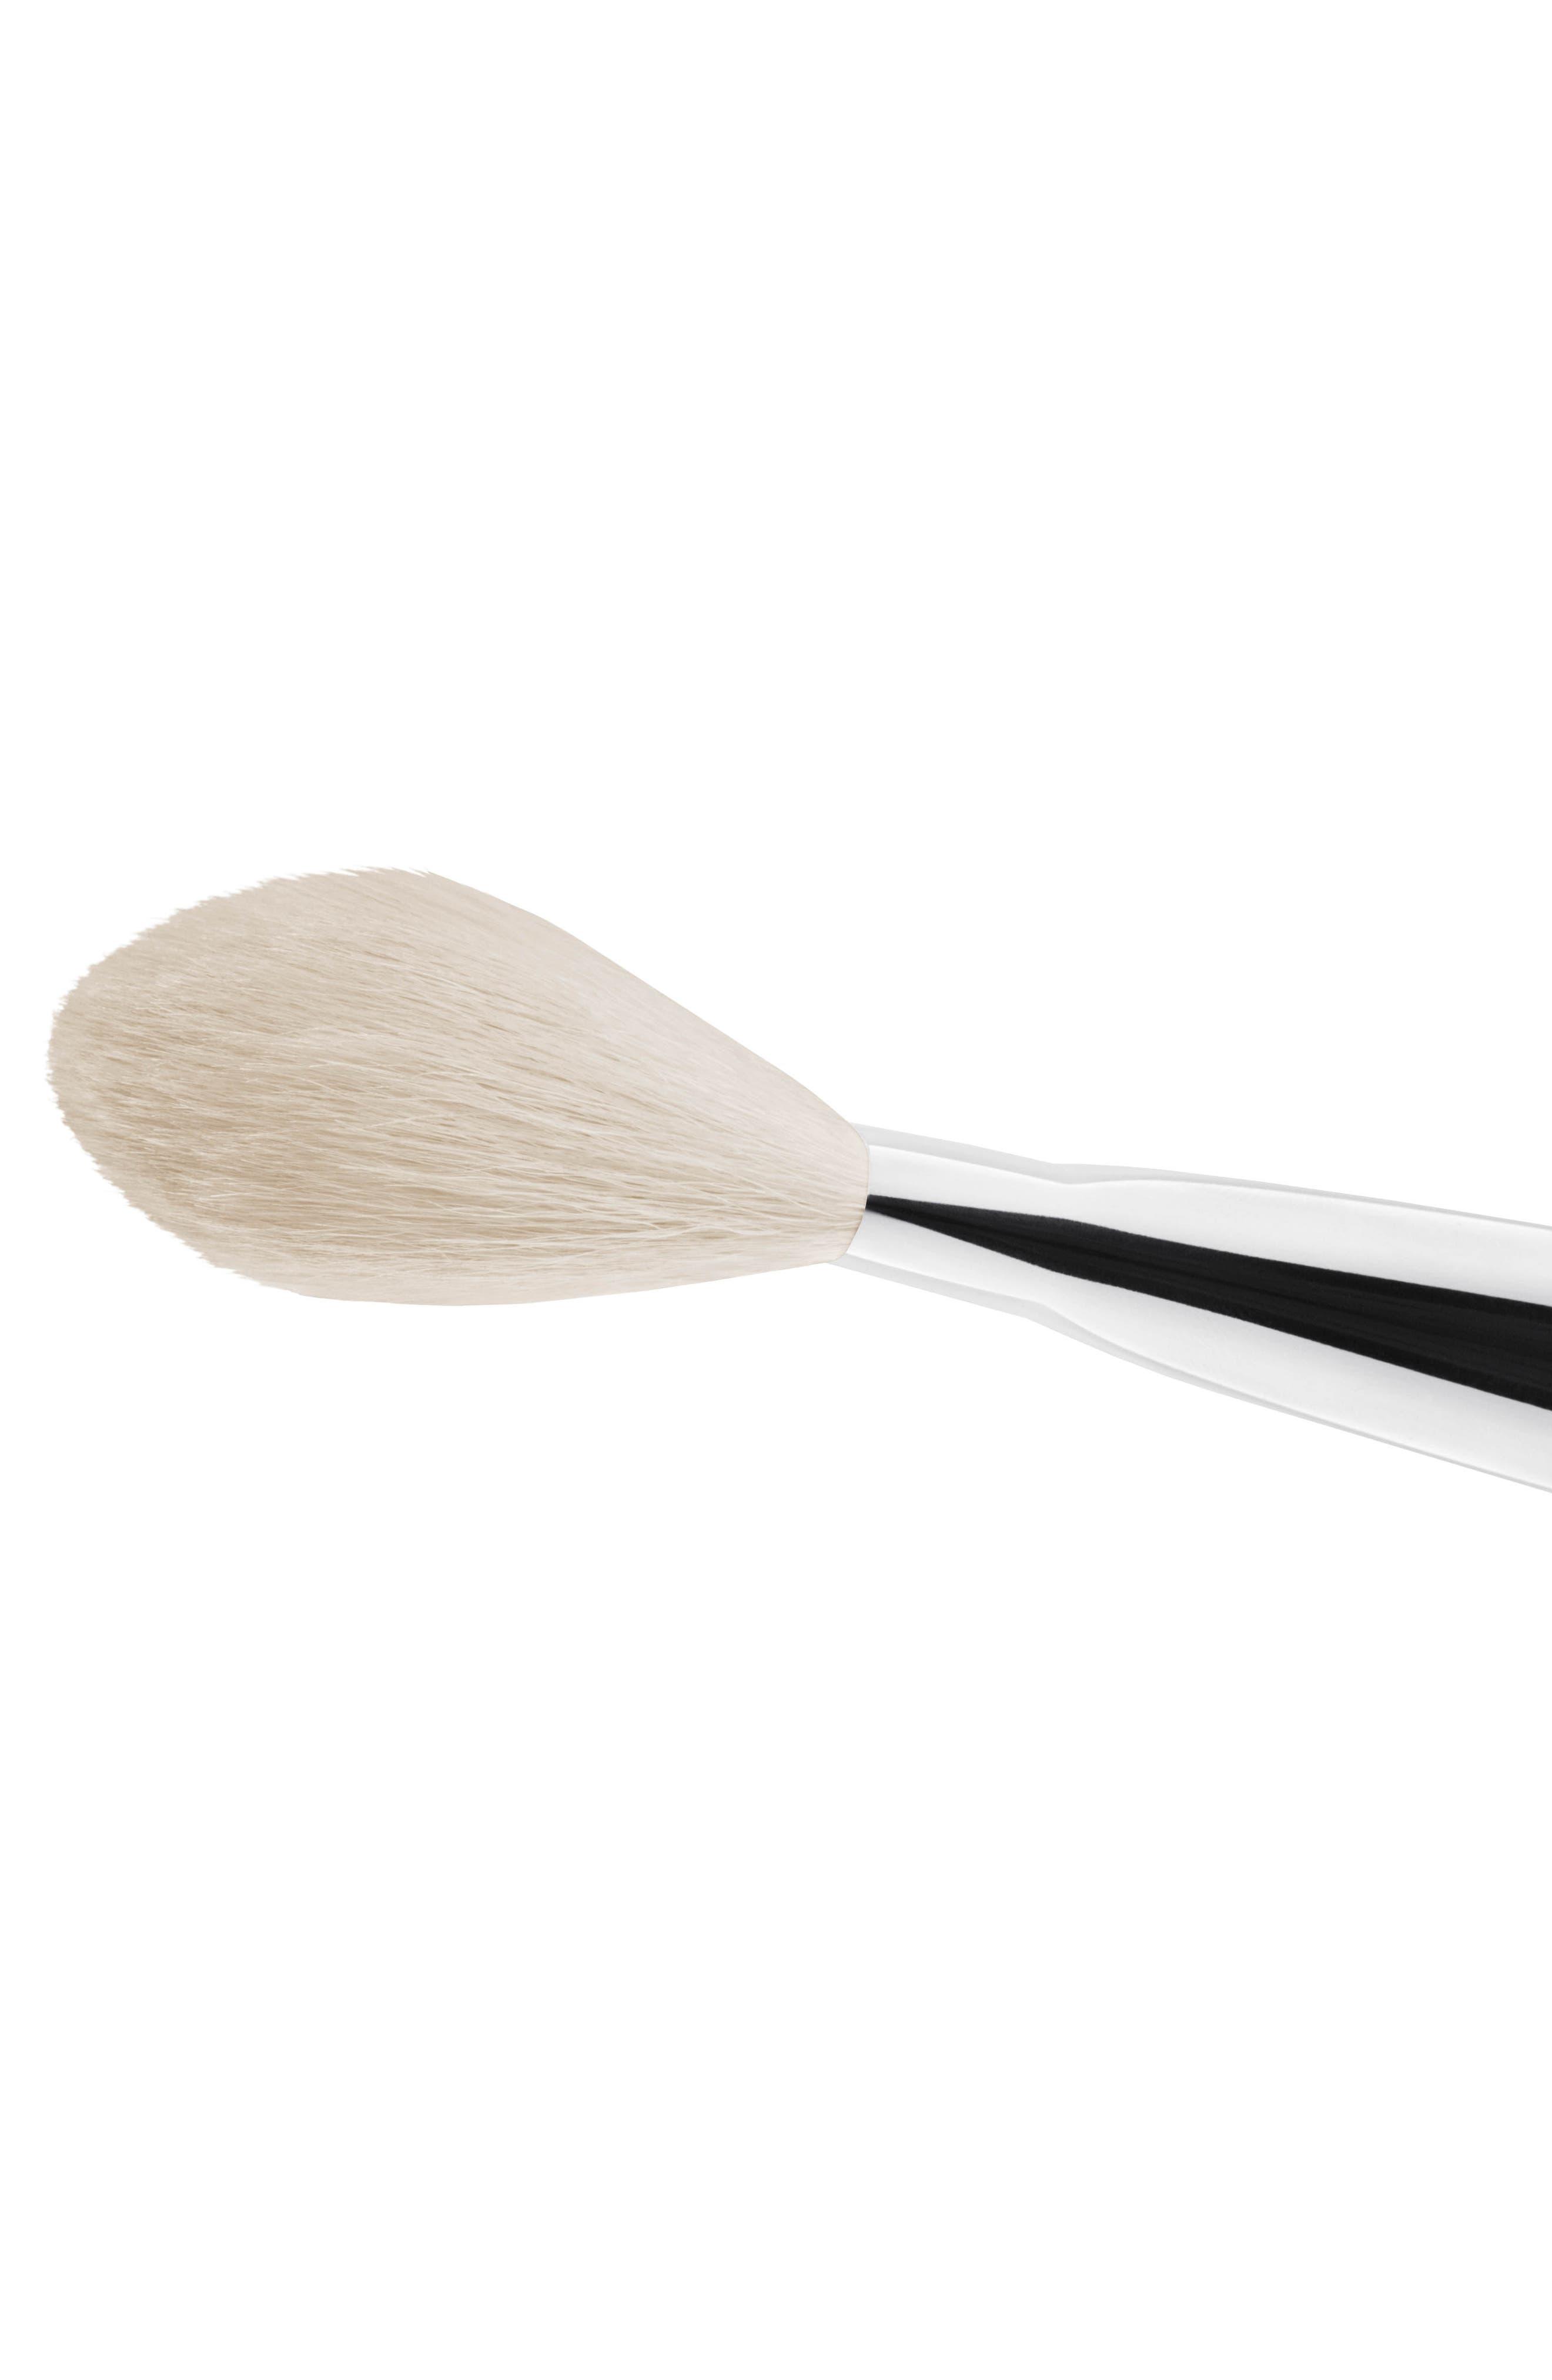 MAC 135S Synthetic Large Flat Powder Brush,                             Alternate thumbnail 2, color,                             000